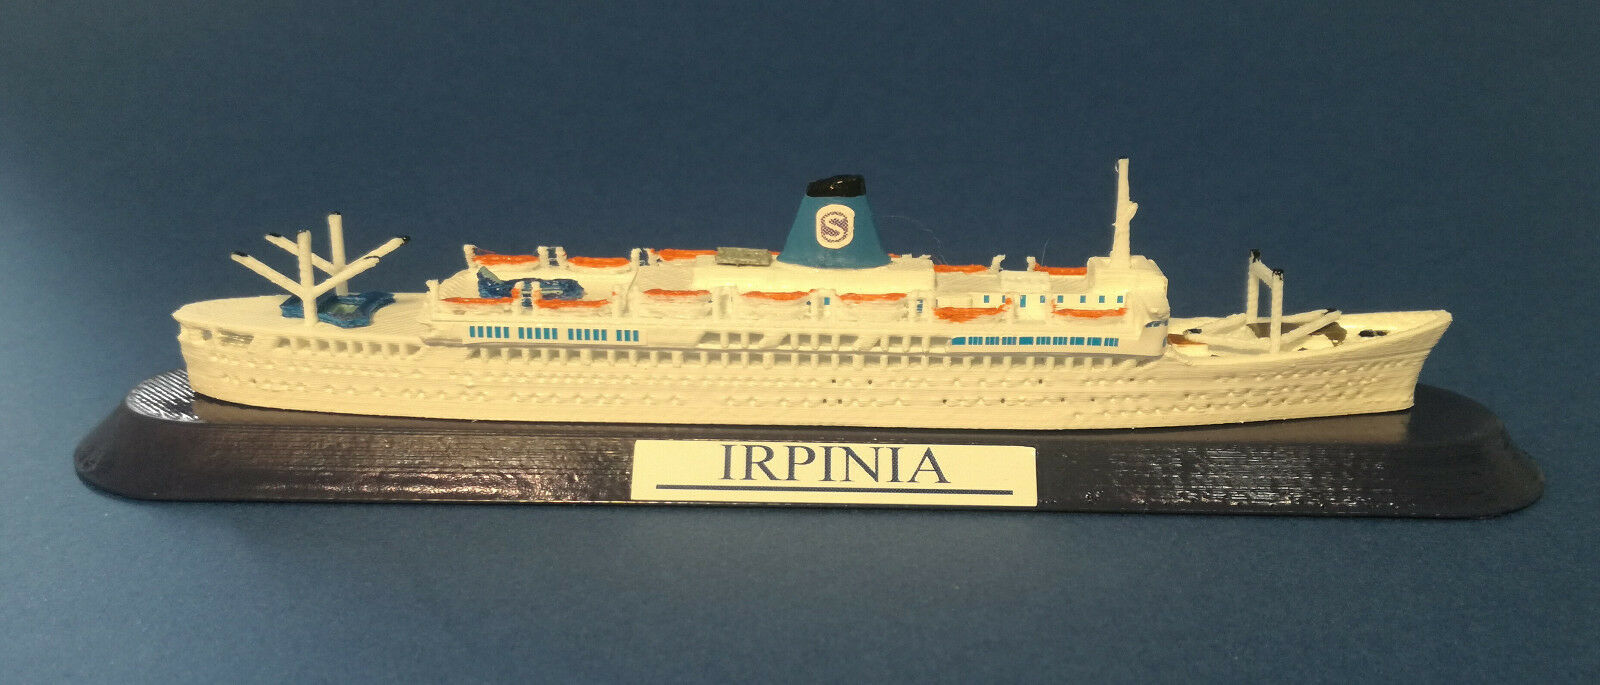 artículos novedosos Nave IRPINIA anni 70 70 70 Ex. Campana SIOSA line  FRATELLI GRIMALDI model ship 1 1250  Venta barata